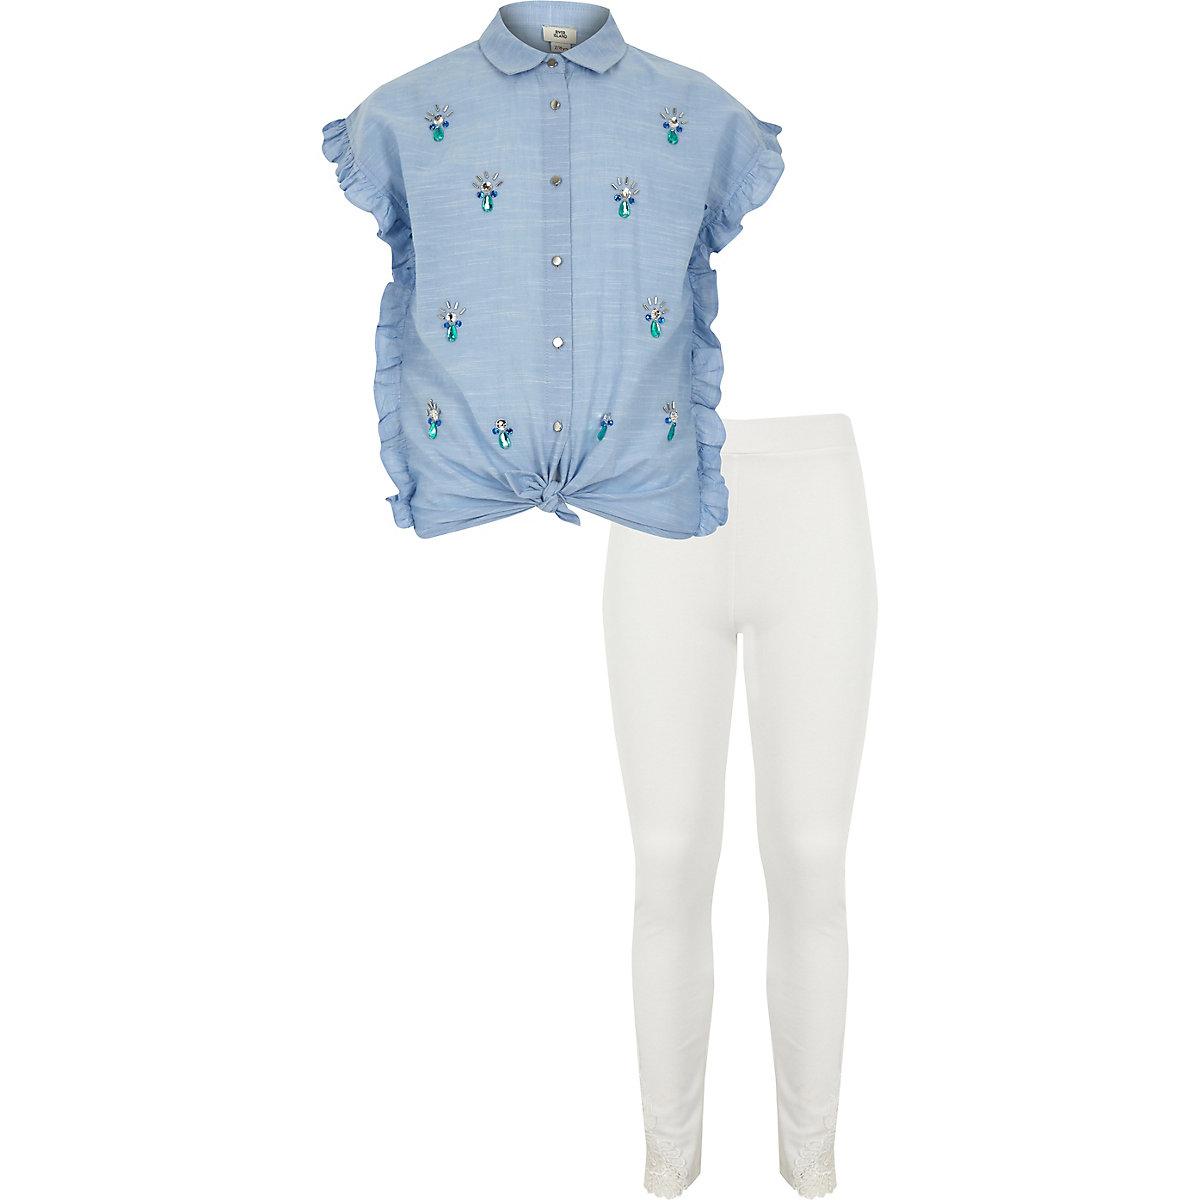 Girls blue jewel embellished shirt outfit